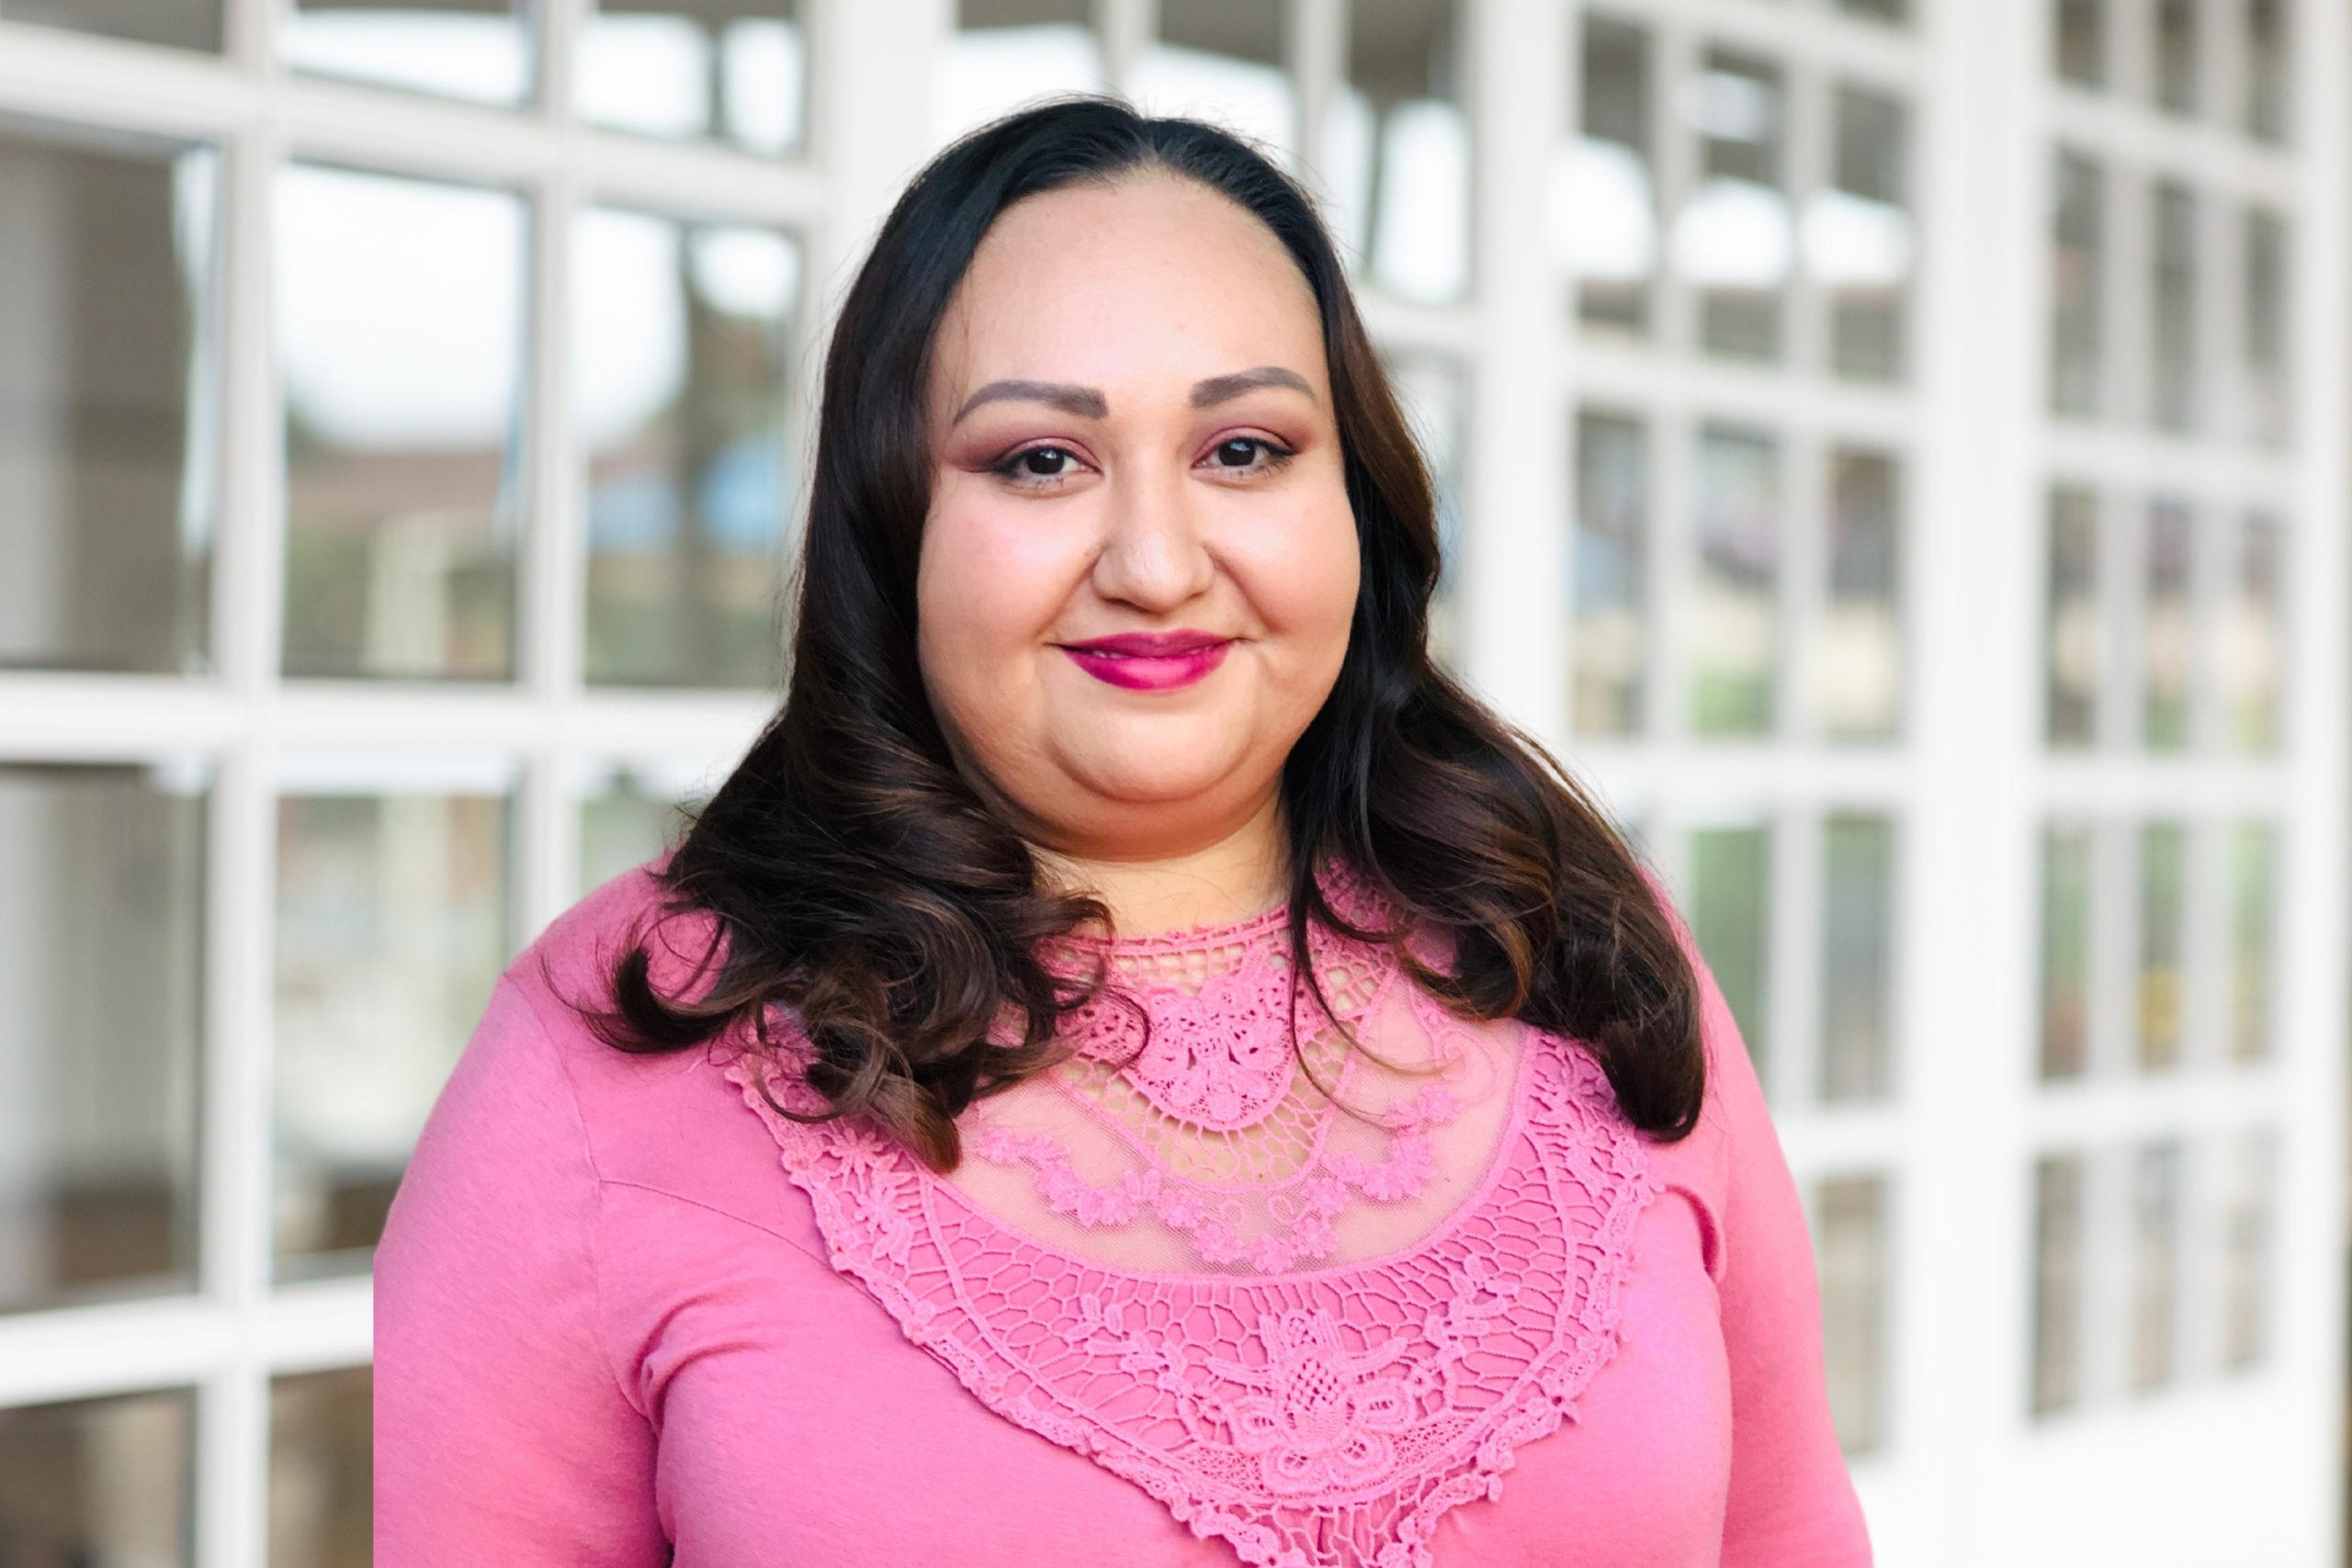 Jessica Hernandez-Benavidez Counselor in San Antonio